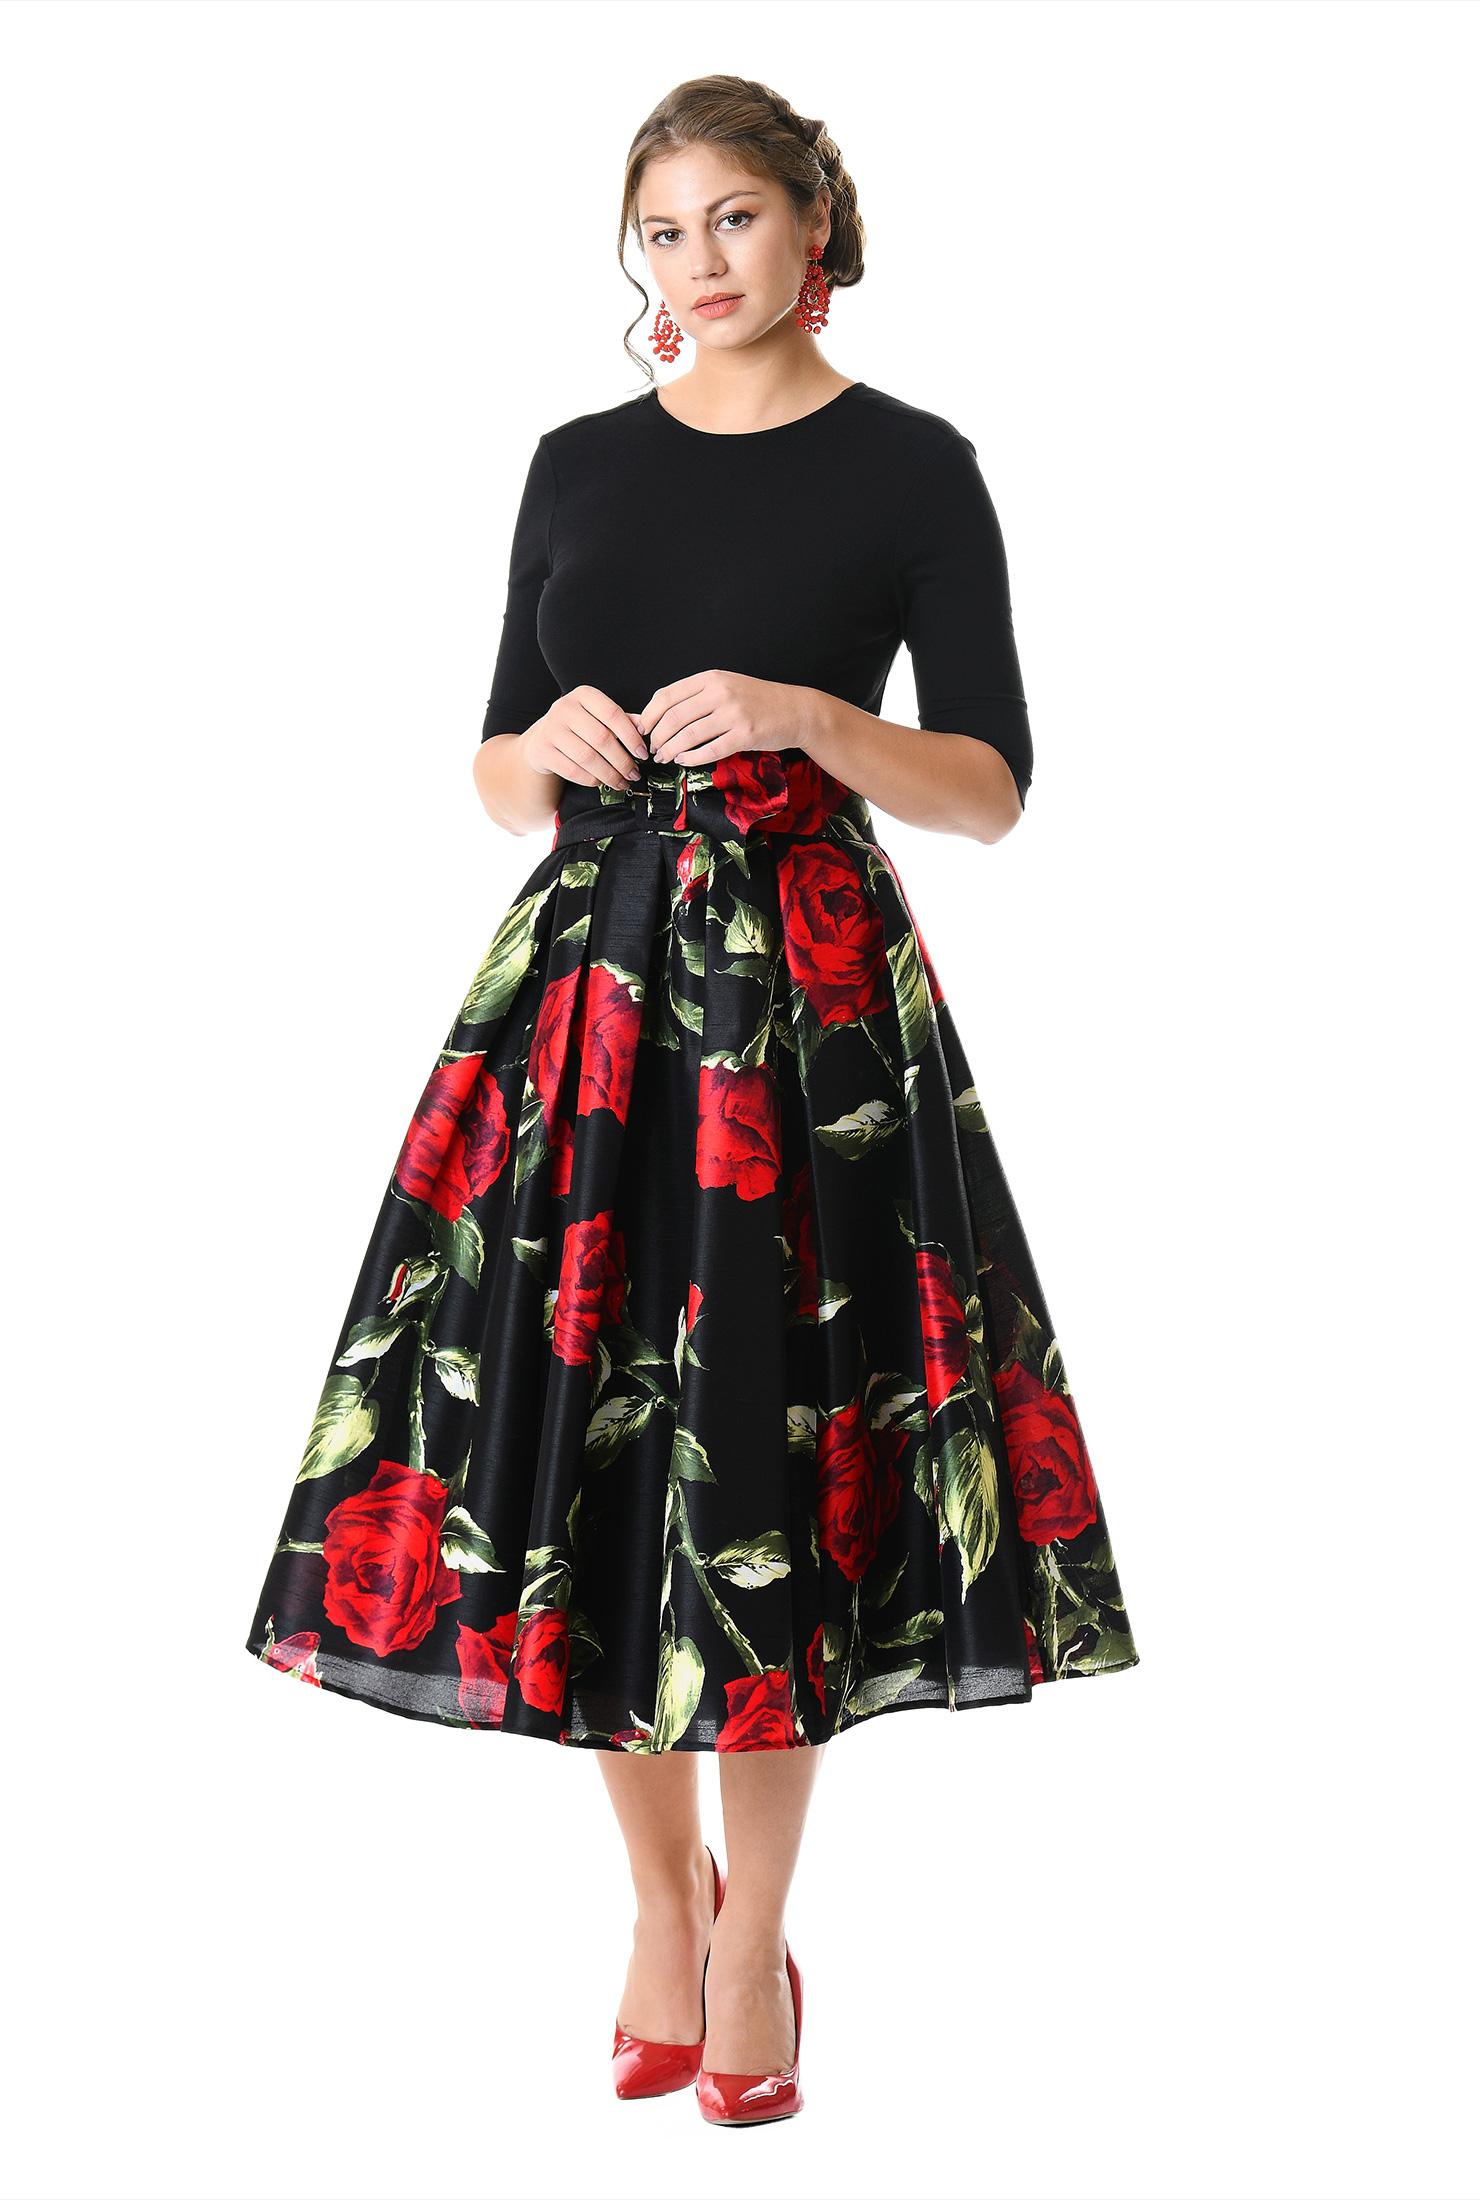 Floral print dupioni and cotton knit dress